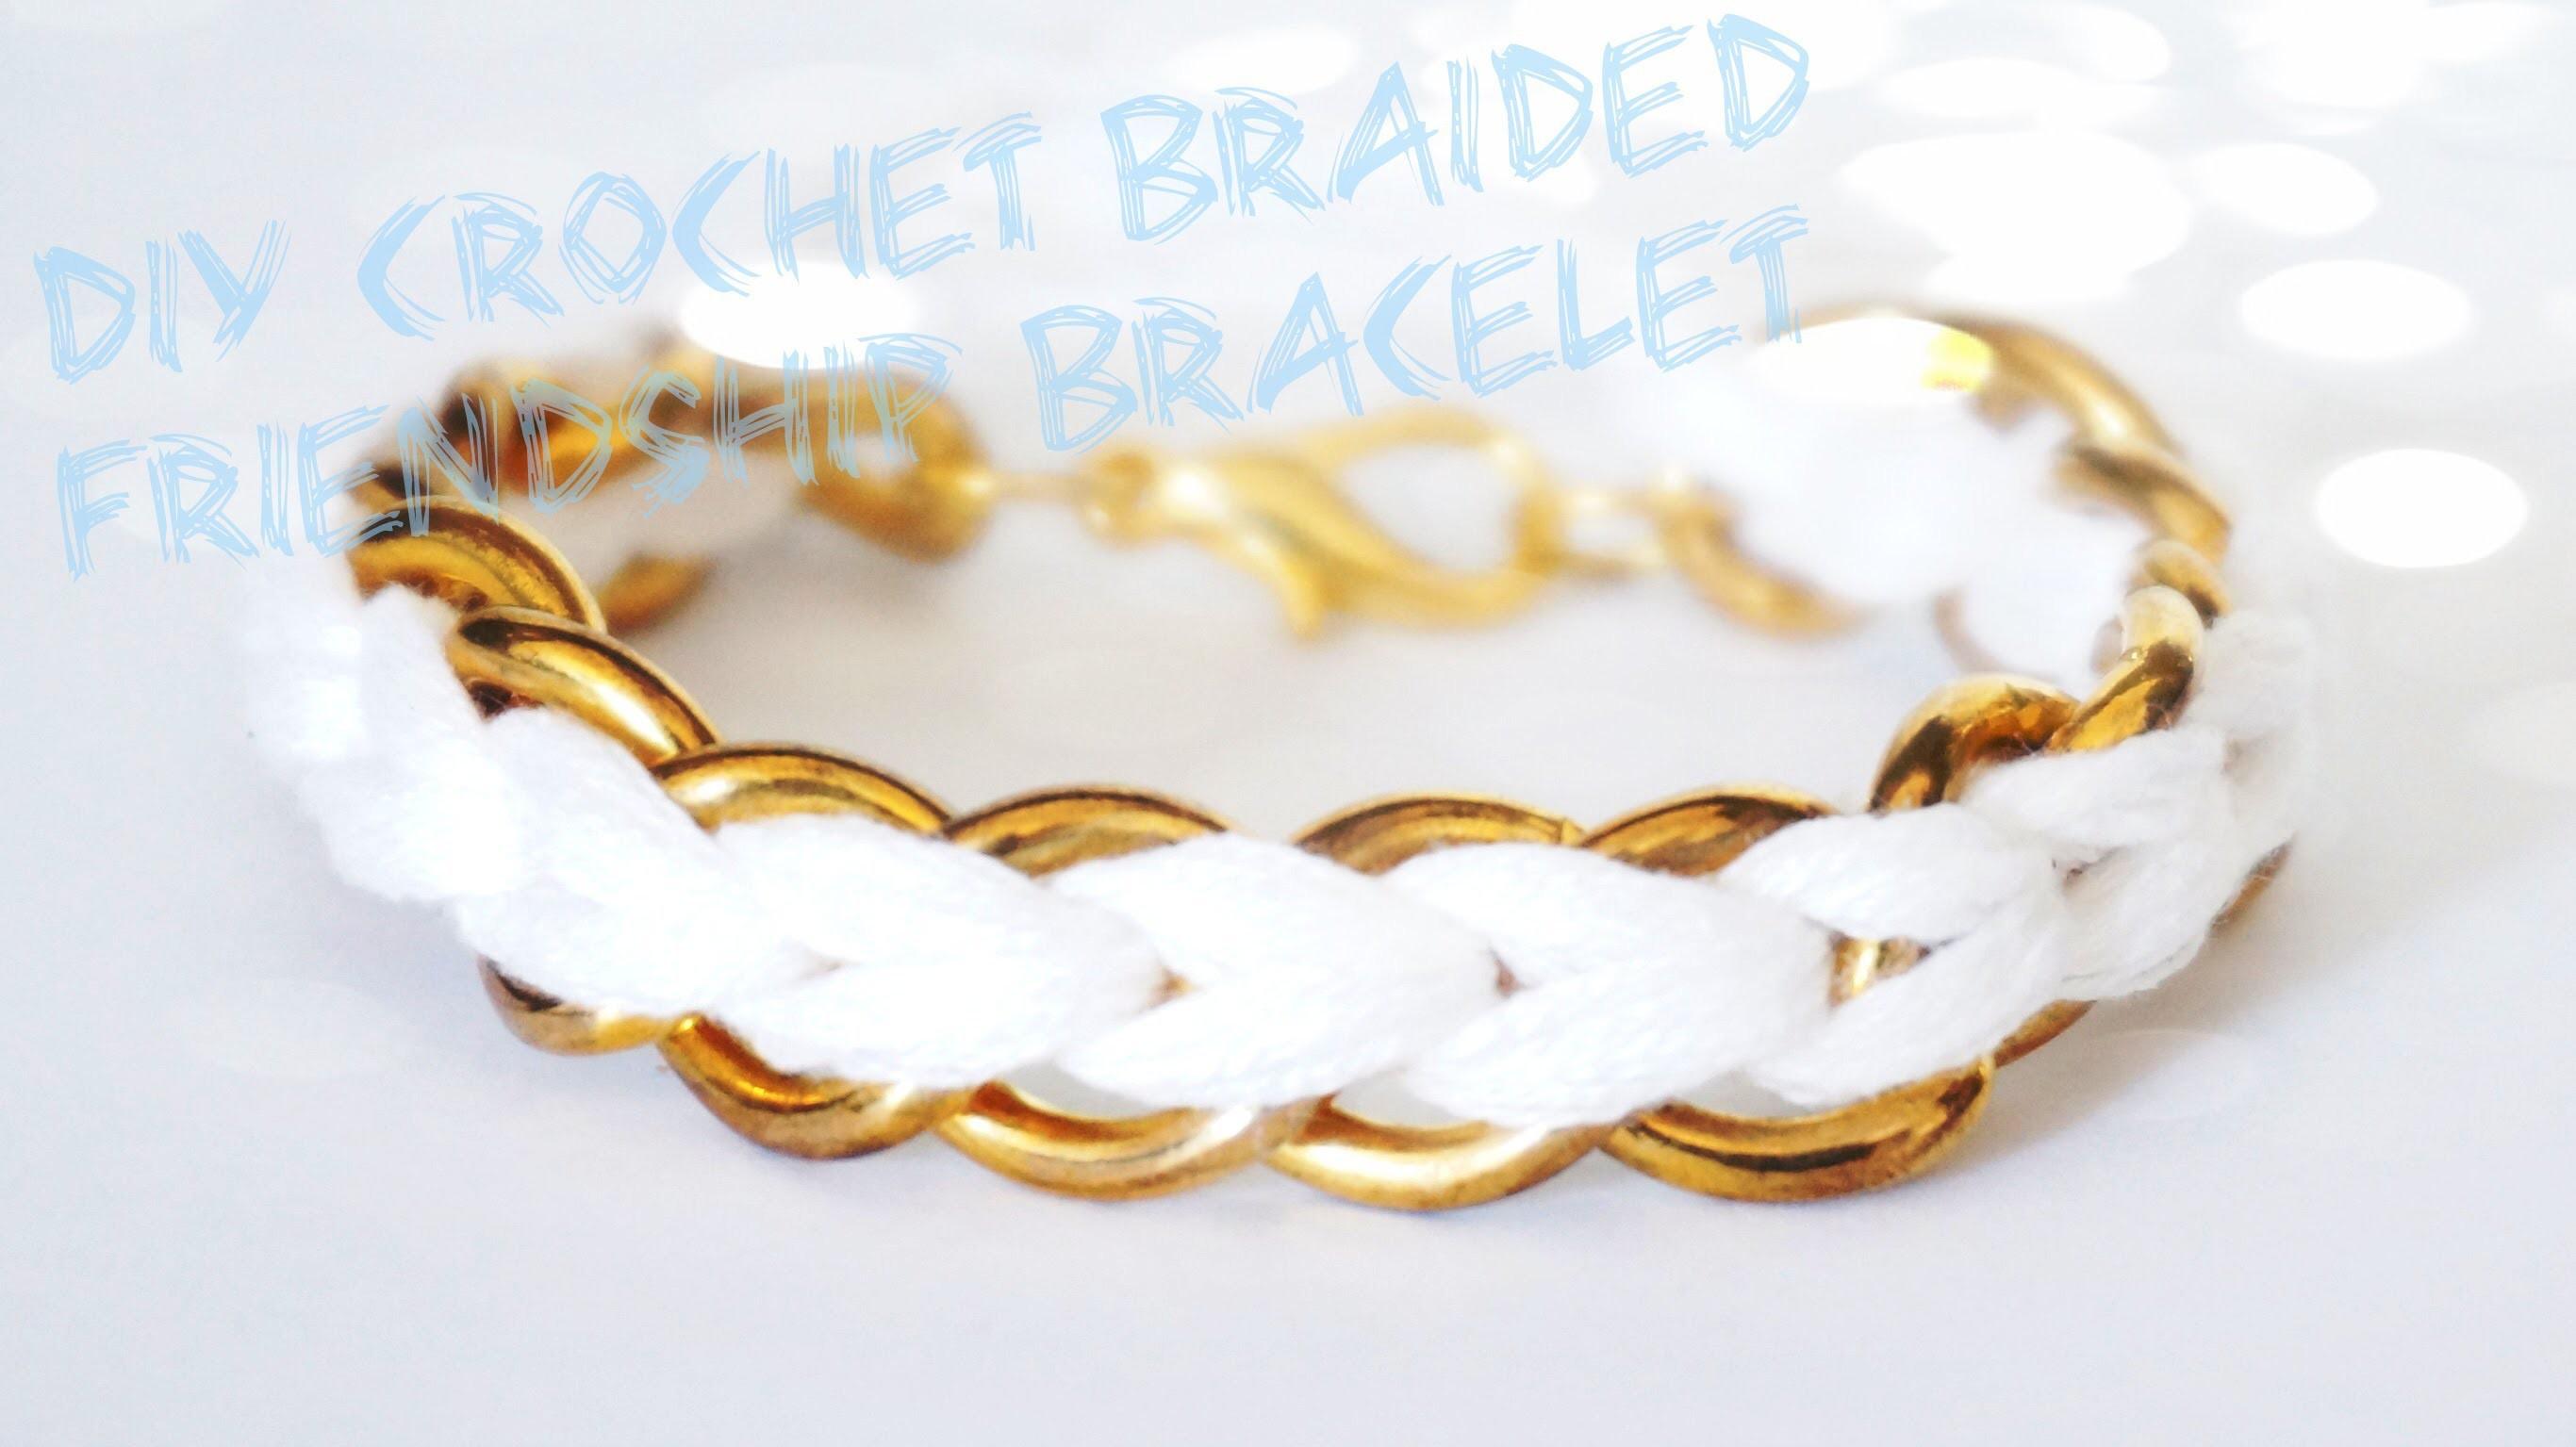 How to: DIY Crochet Braided Chain Bracelet